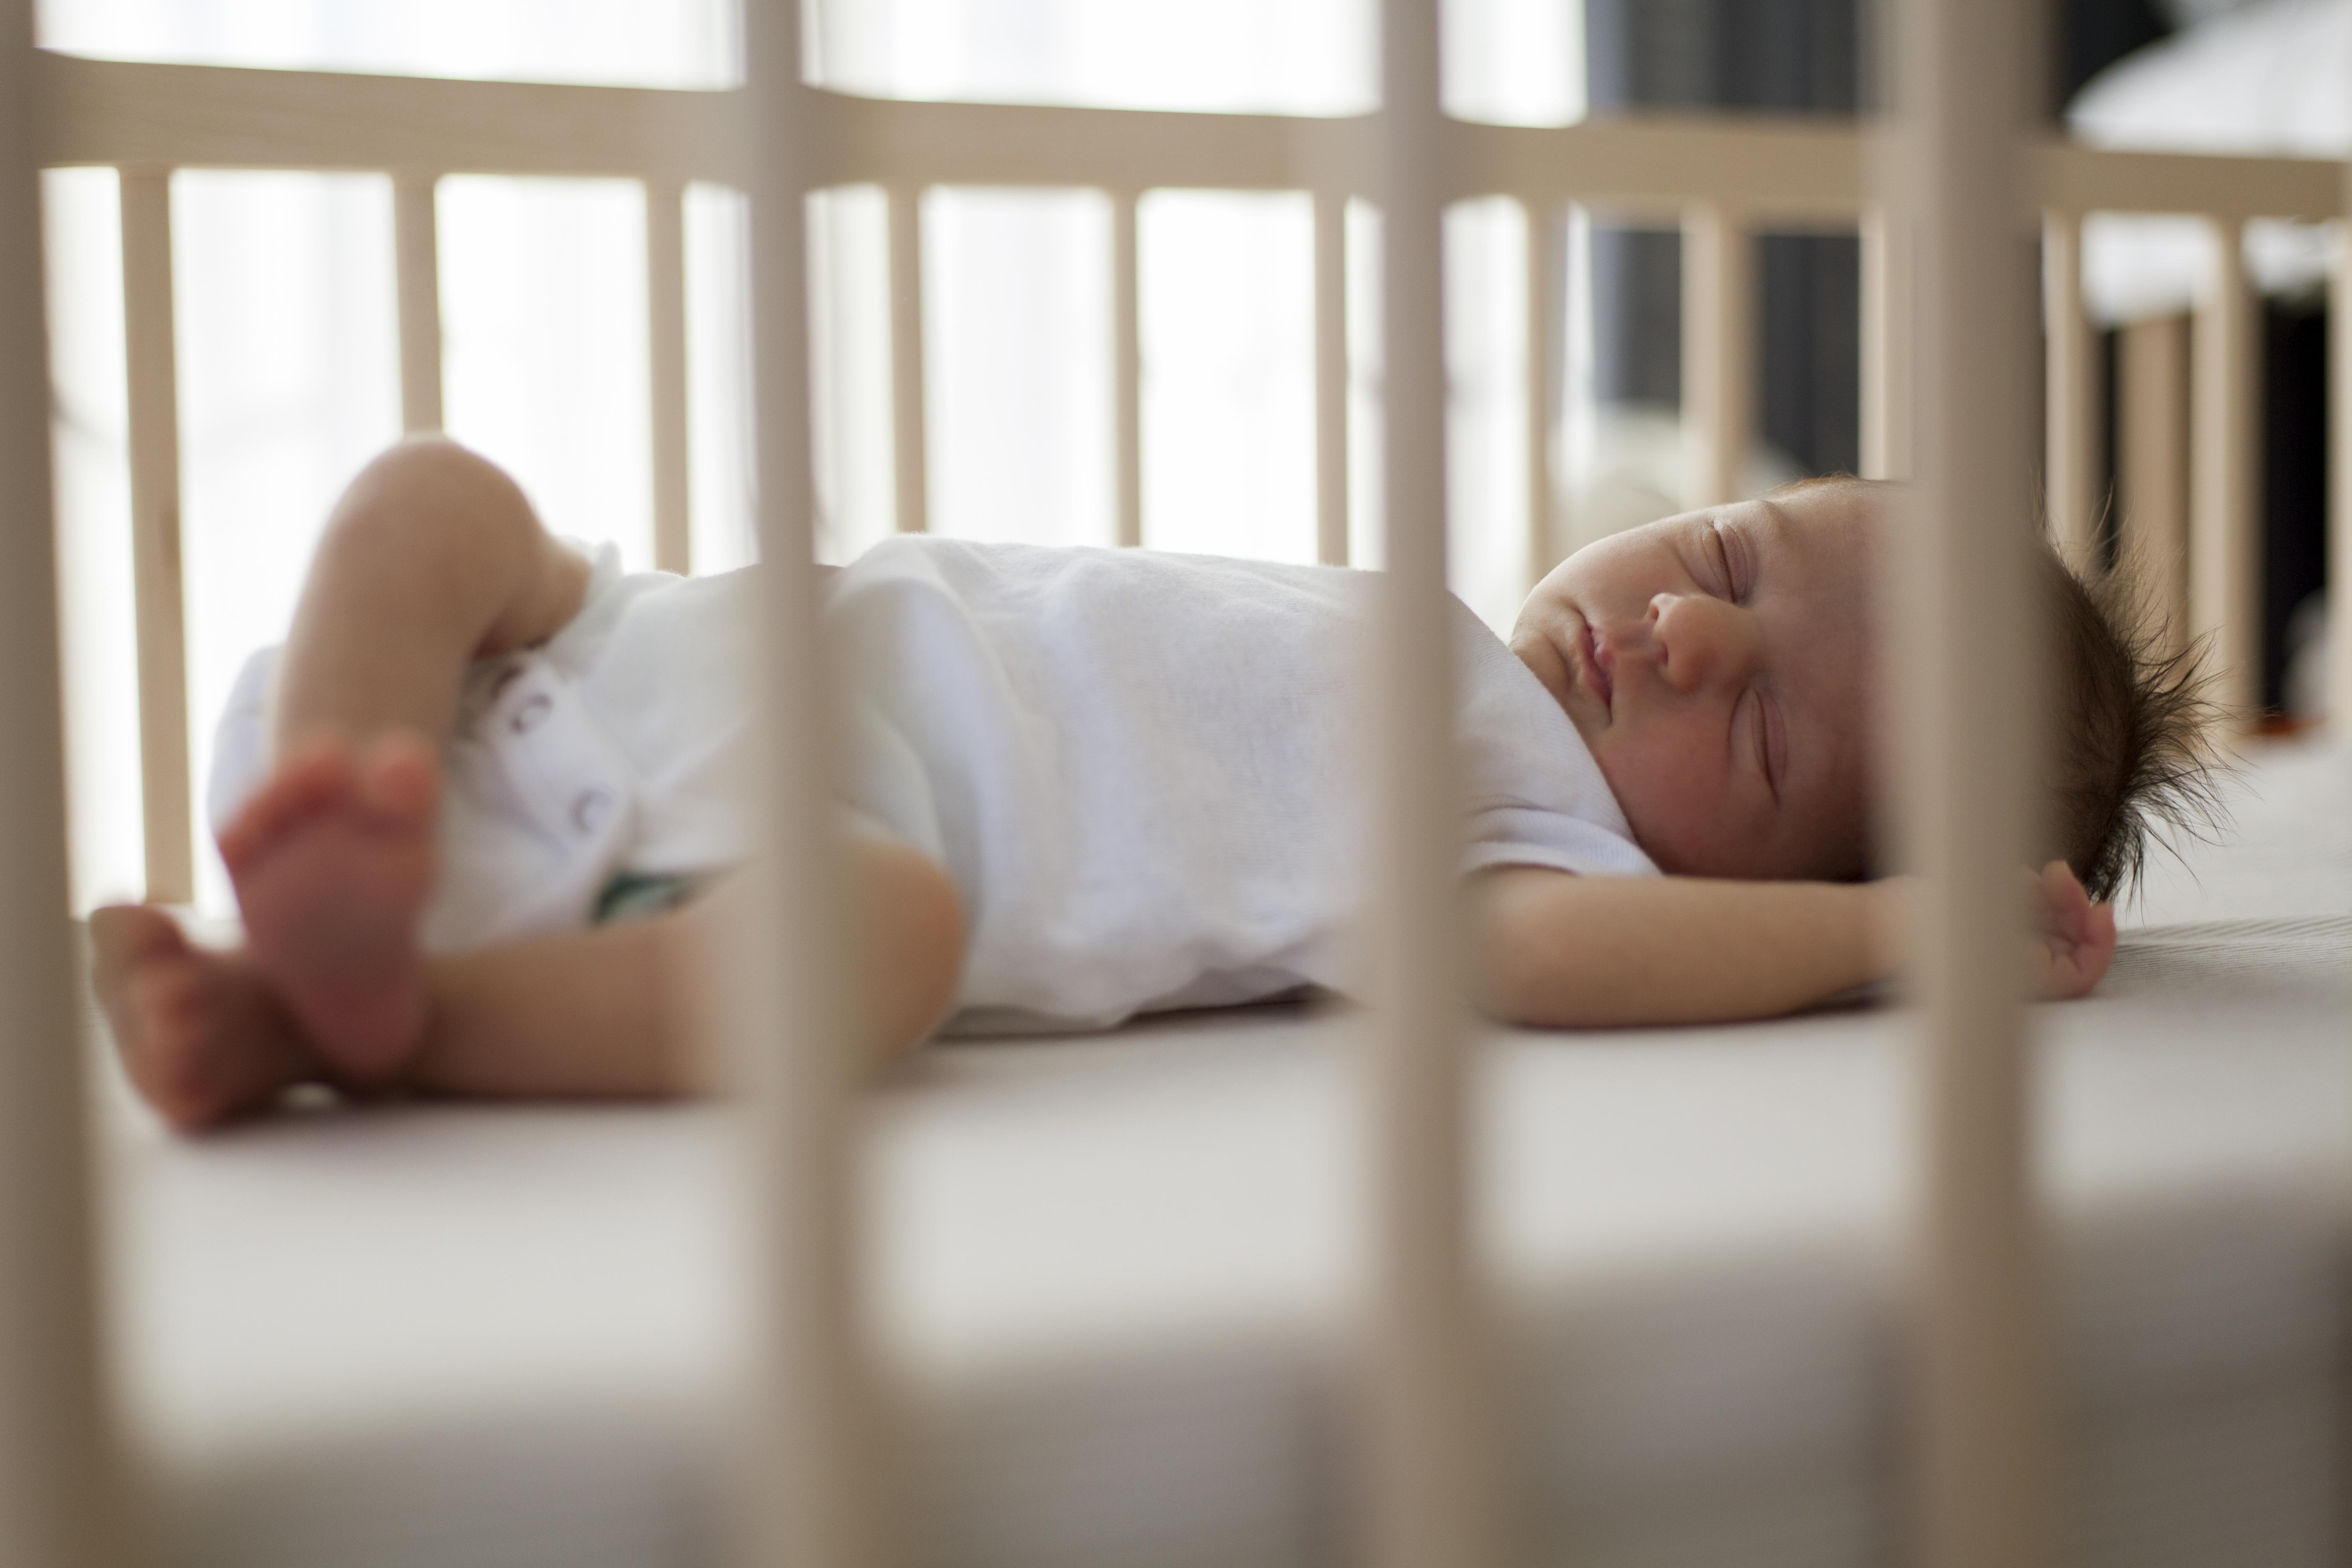 Safer sleep advice saves babies' lives